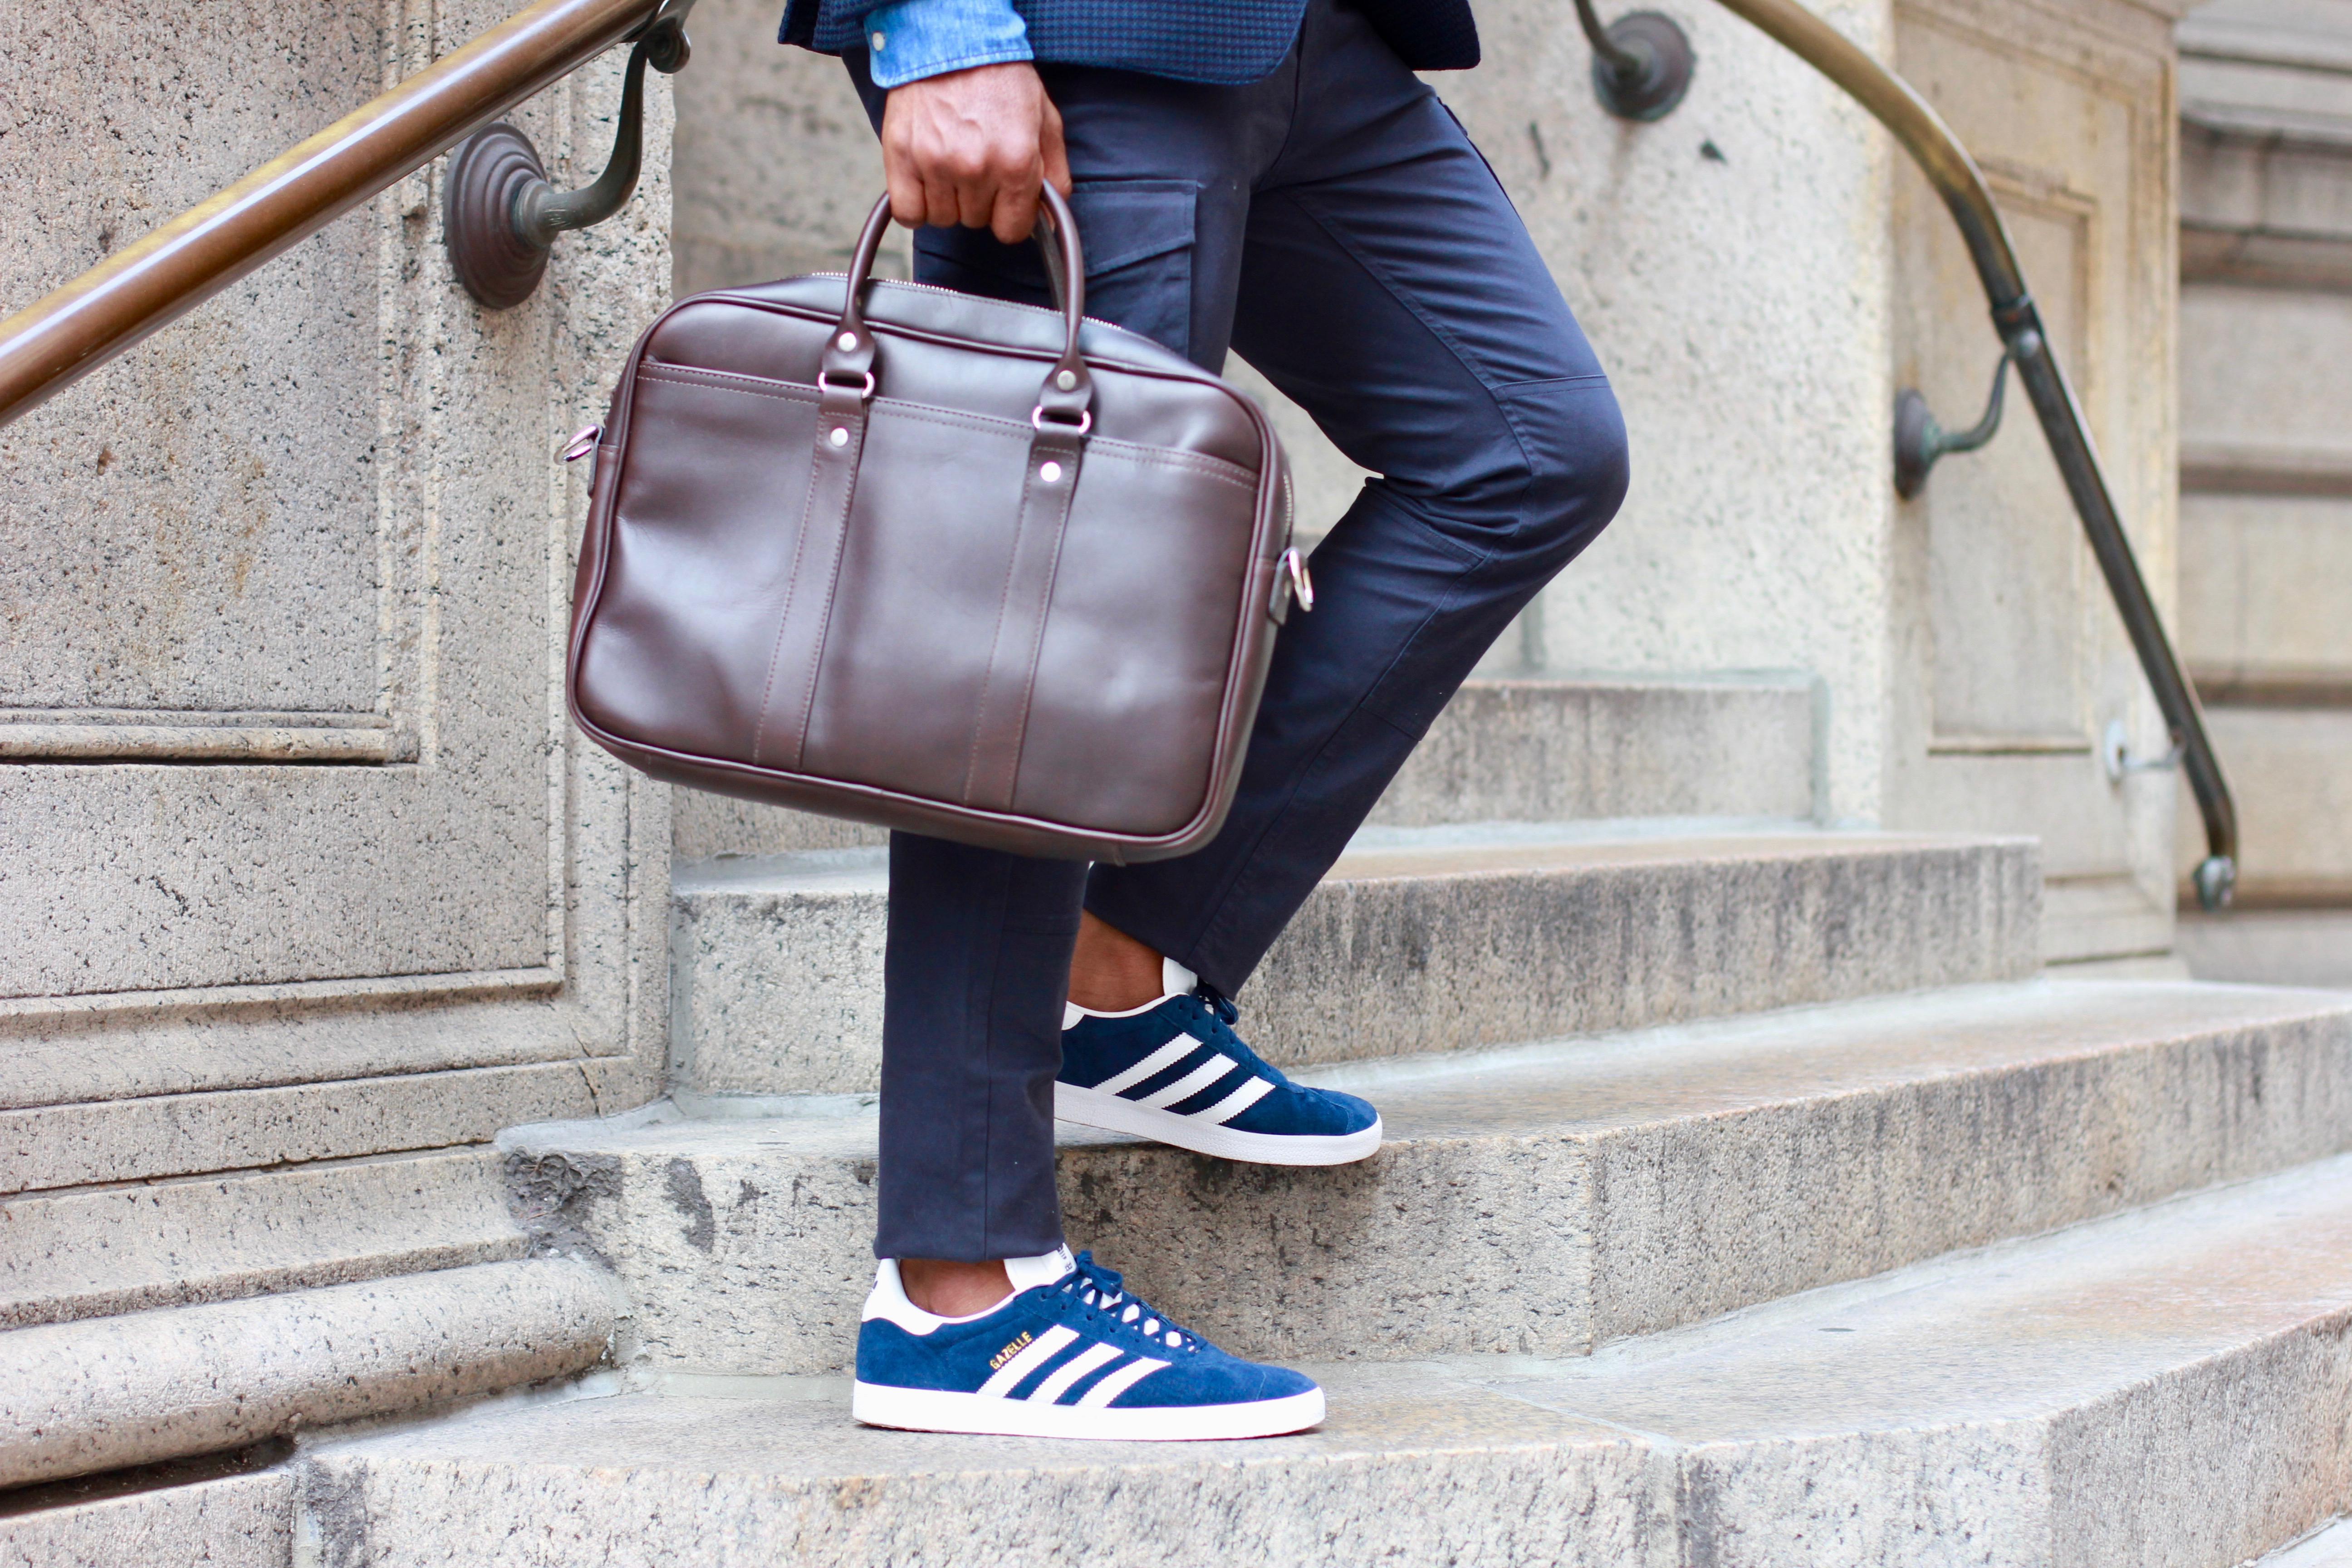 gorra volverse loco mermelada  The Resurgence Of The Luxe Suede Adidas Gazelle – Men's Style Pro ...